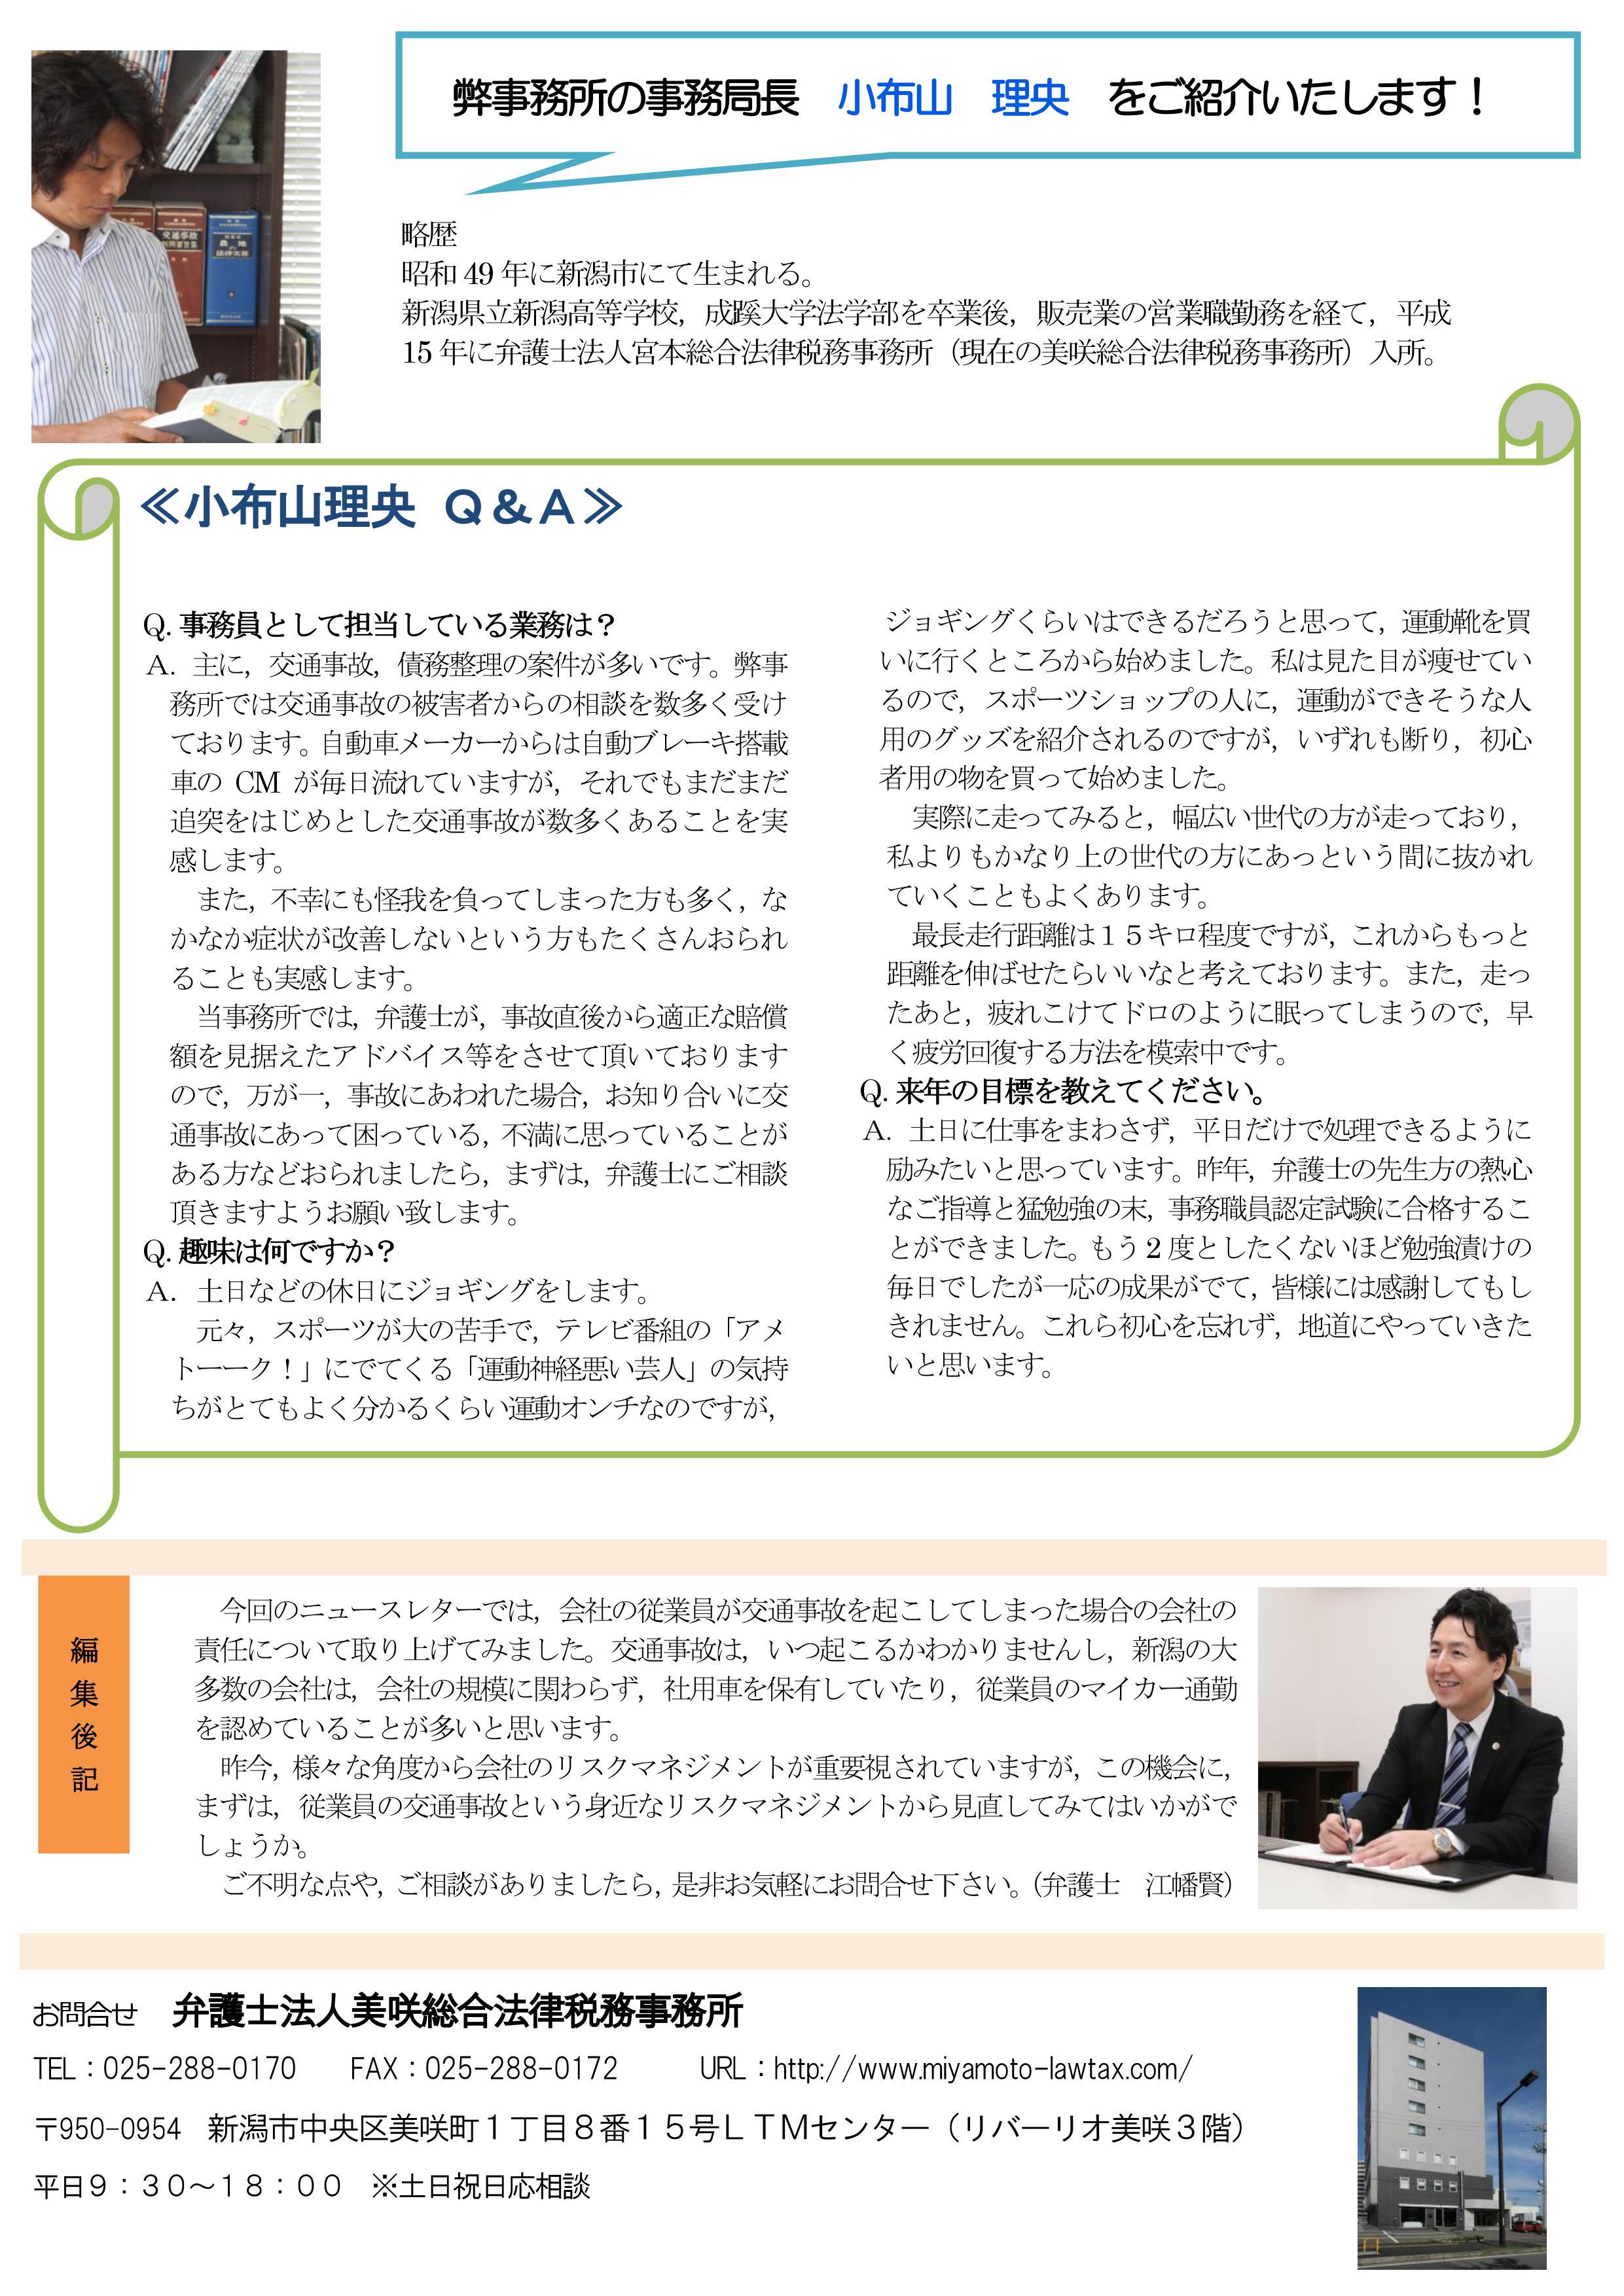 201702MISAKINewslettervol.7-2.jpg